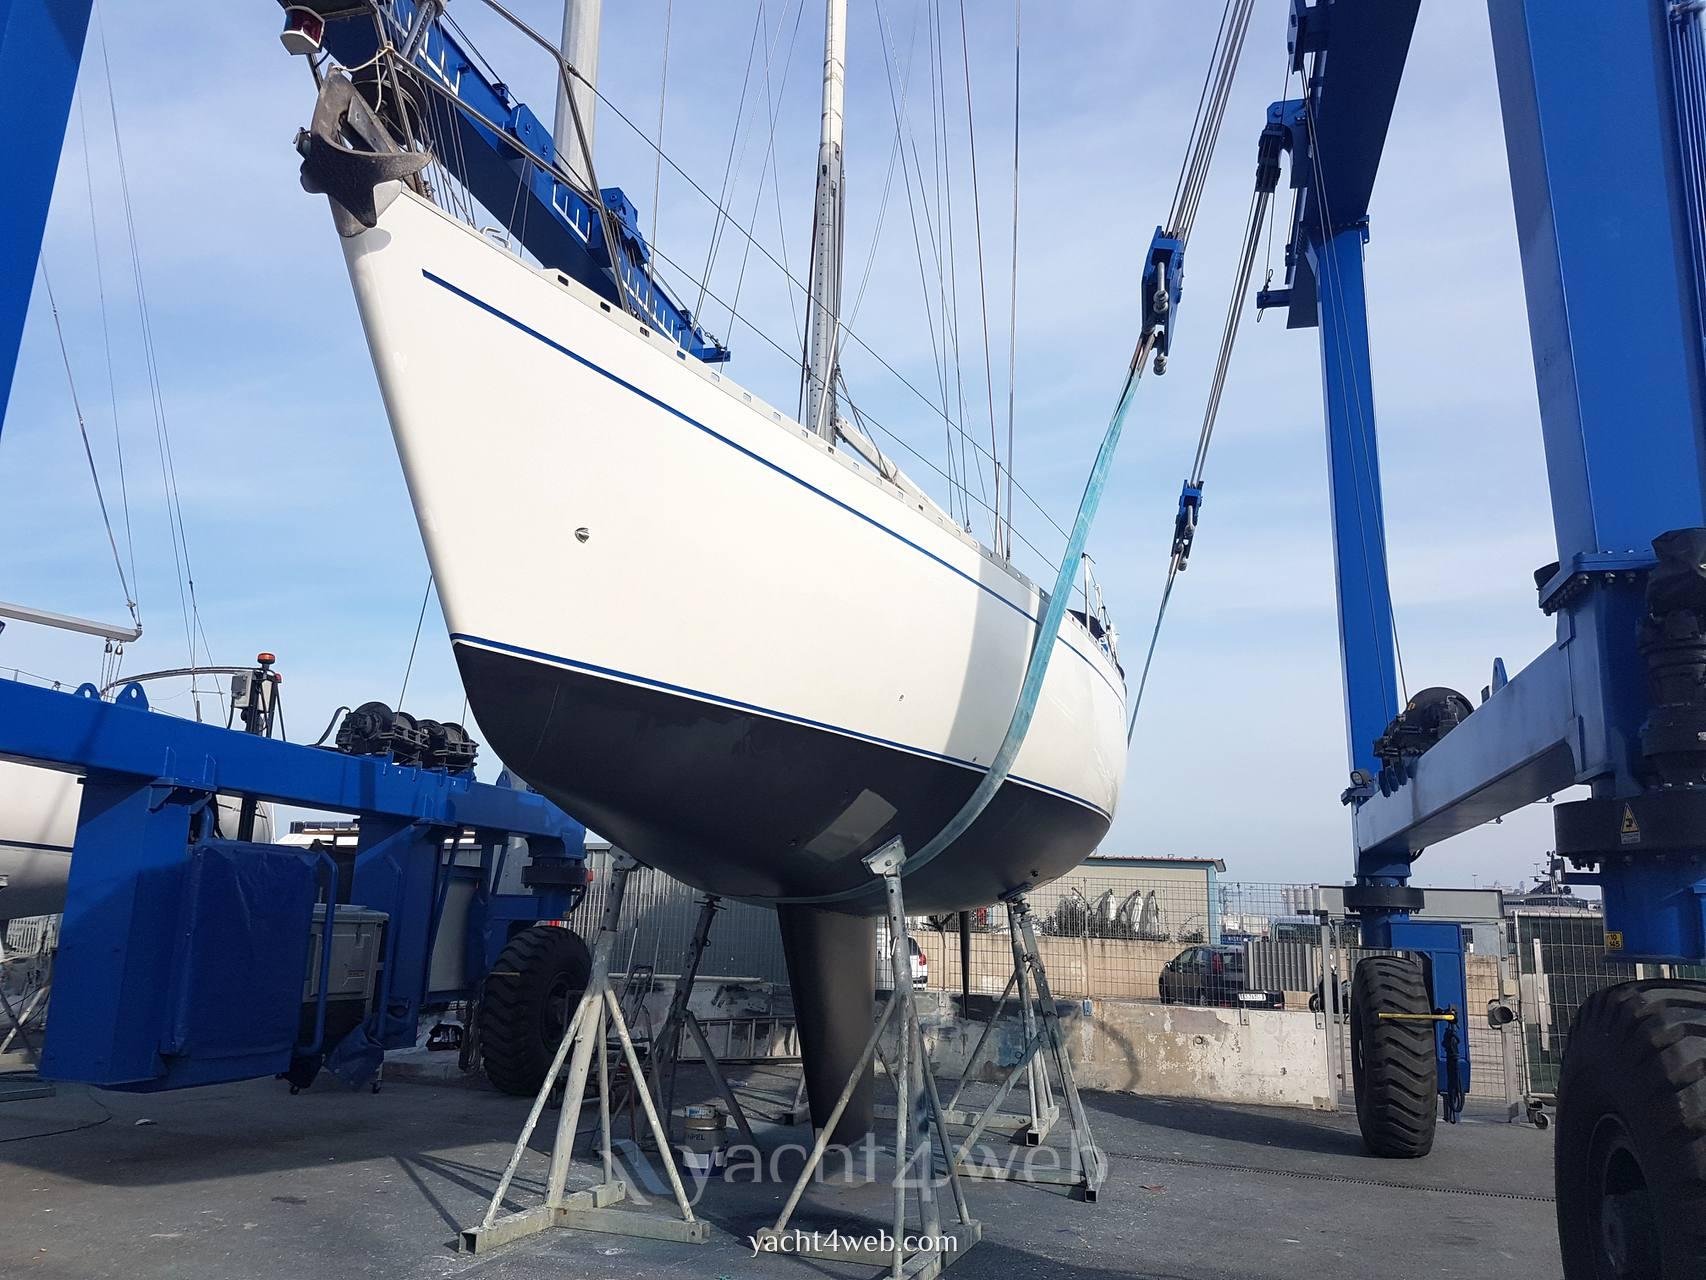 Comar Comet 12 Barca a vela usata in vendita